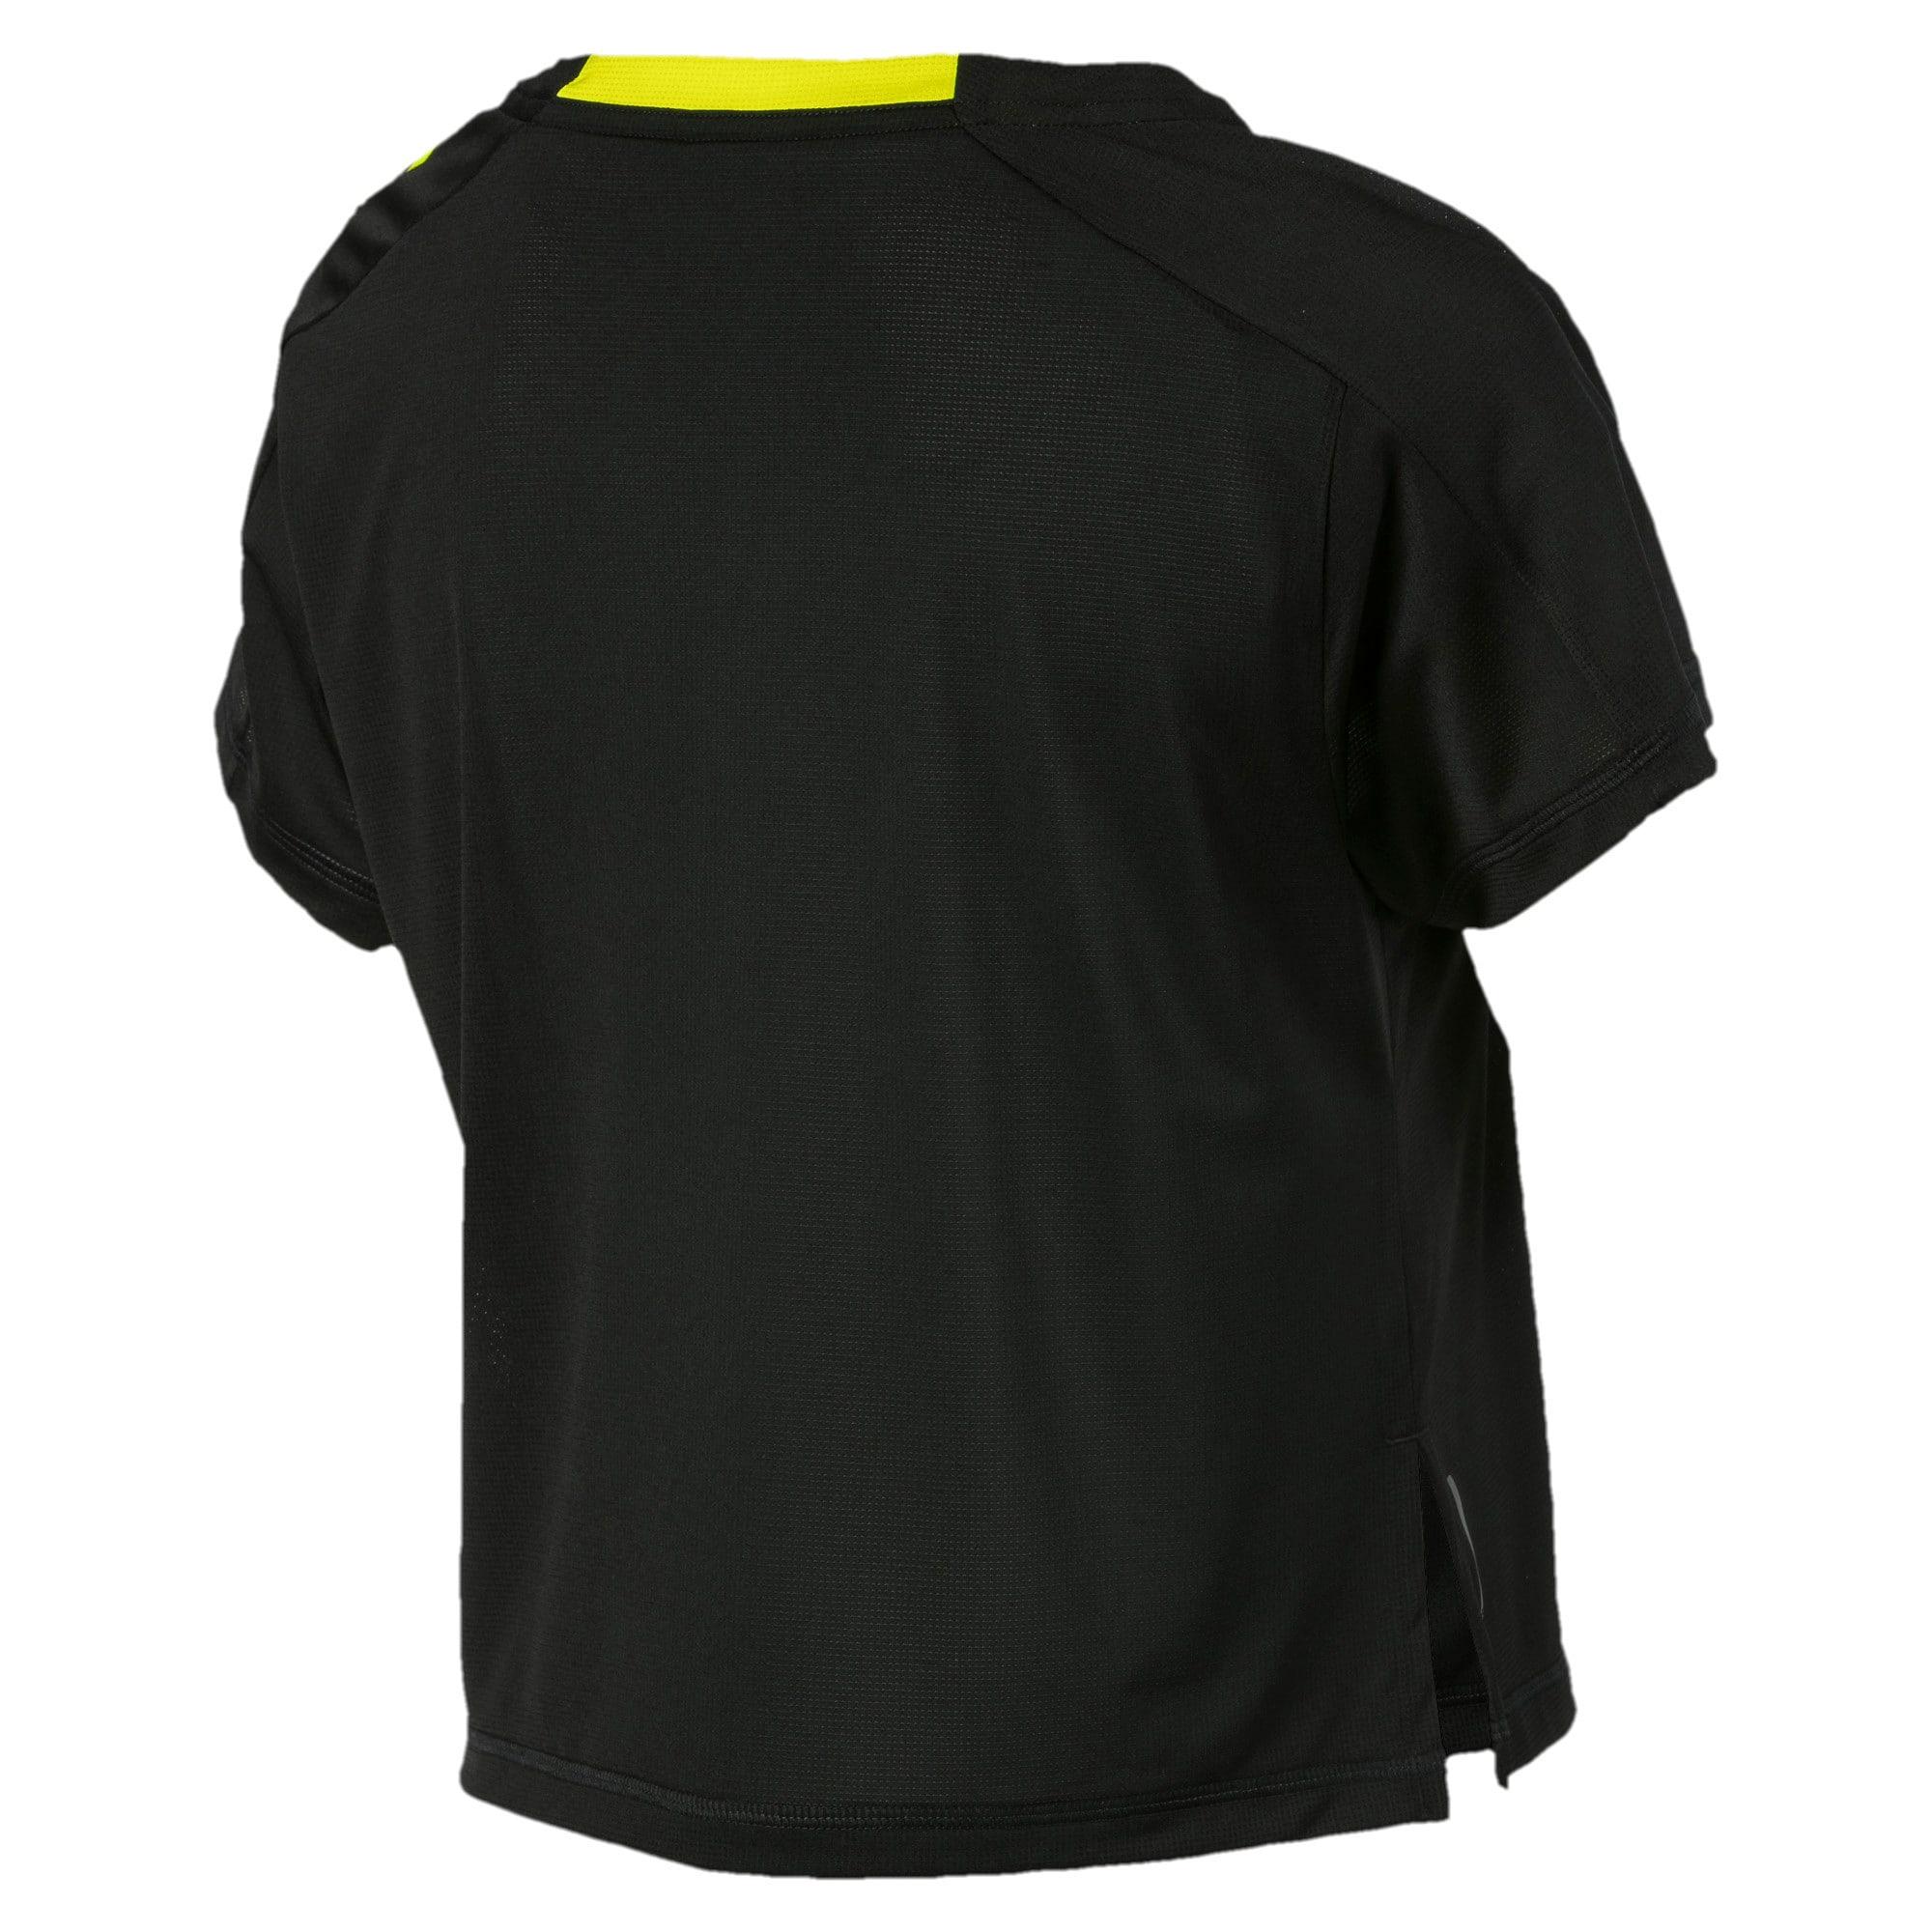 Thumbnail 5 of Cropped Short Sleeve Women's Training Tee, Puma Black-Yellow Alert, medium-IND